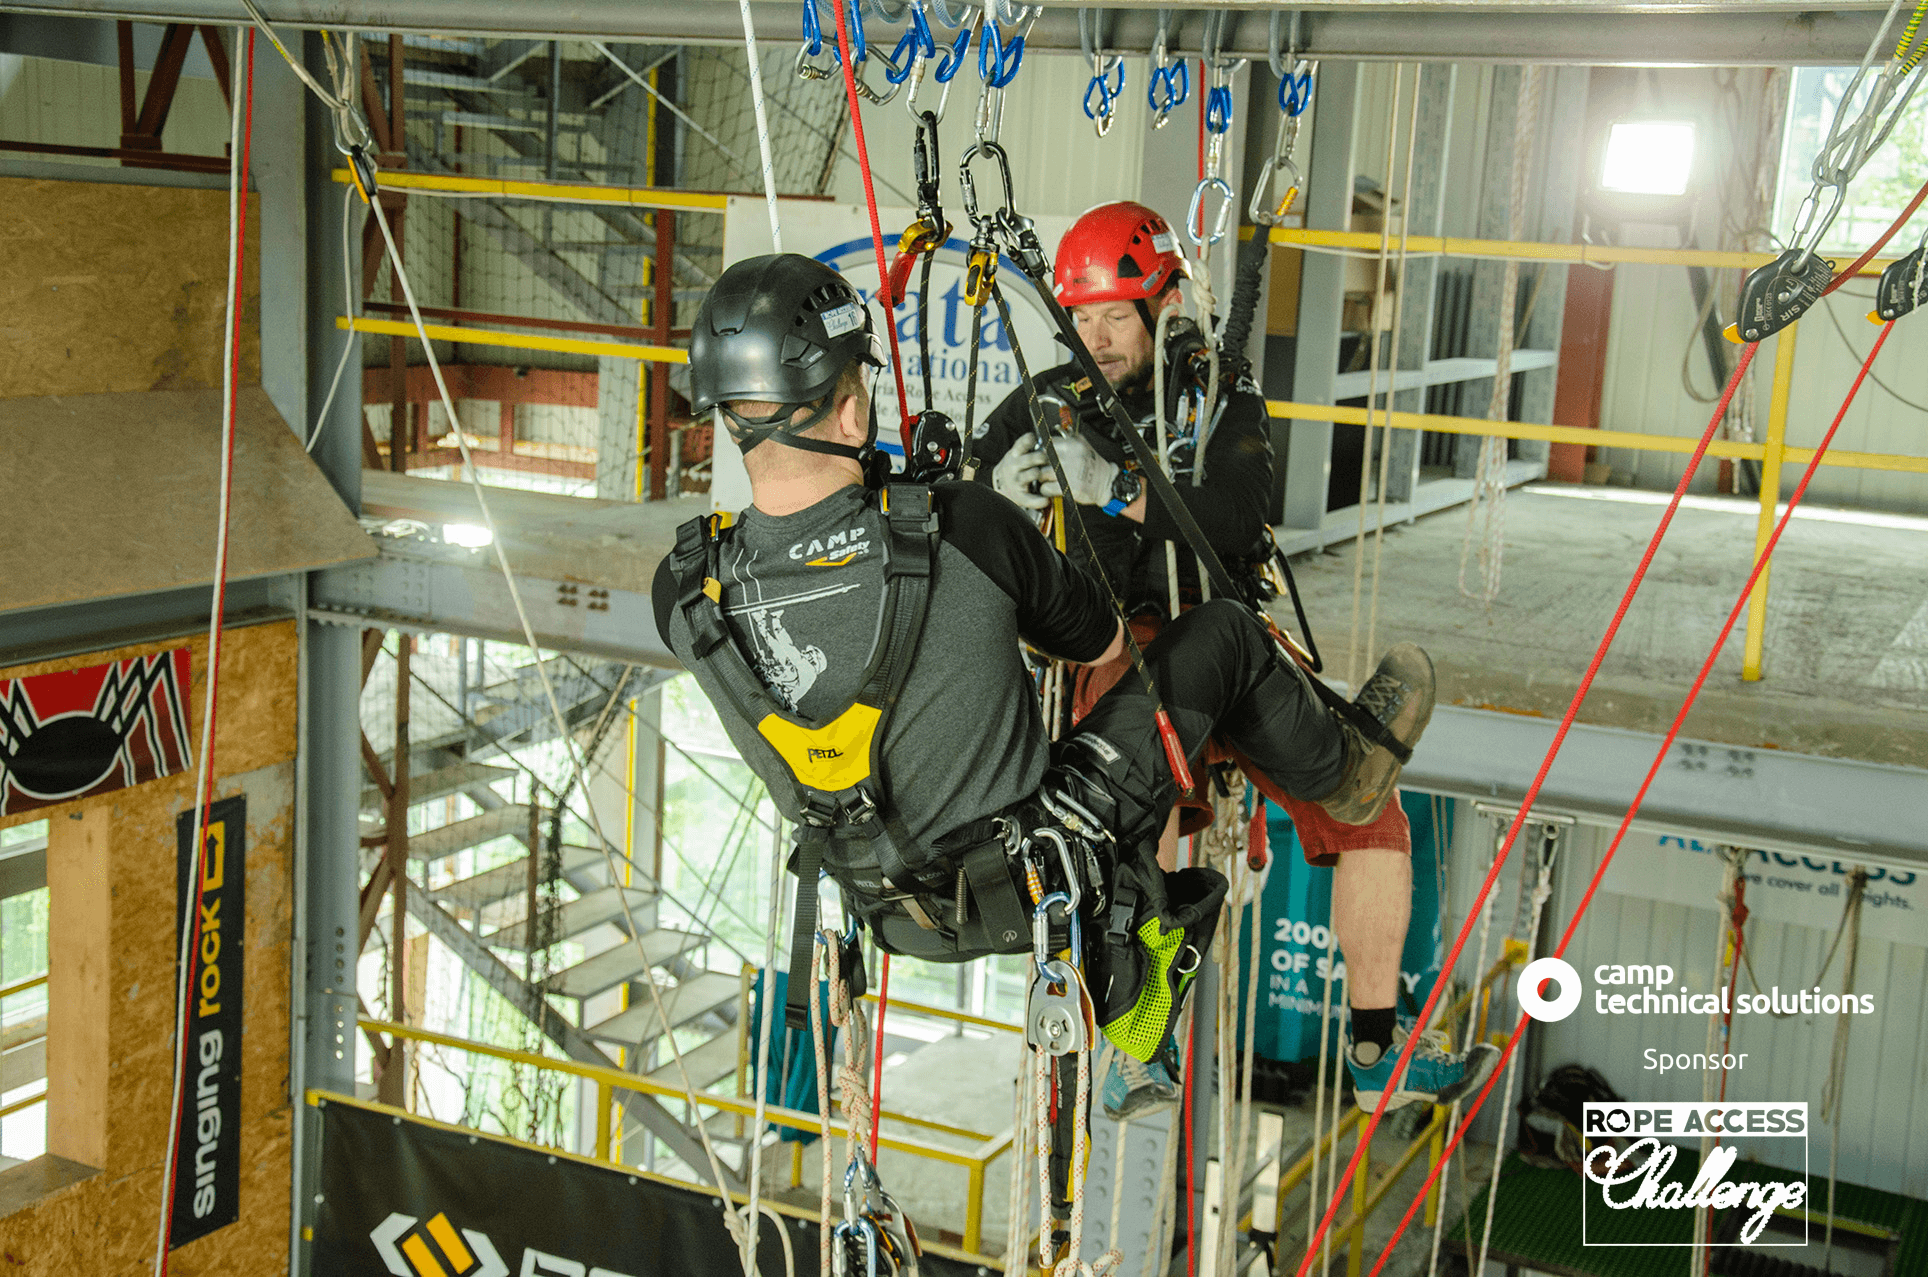 cum-decurs-rope-access-challenge-2019-6